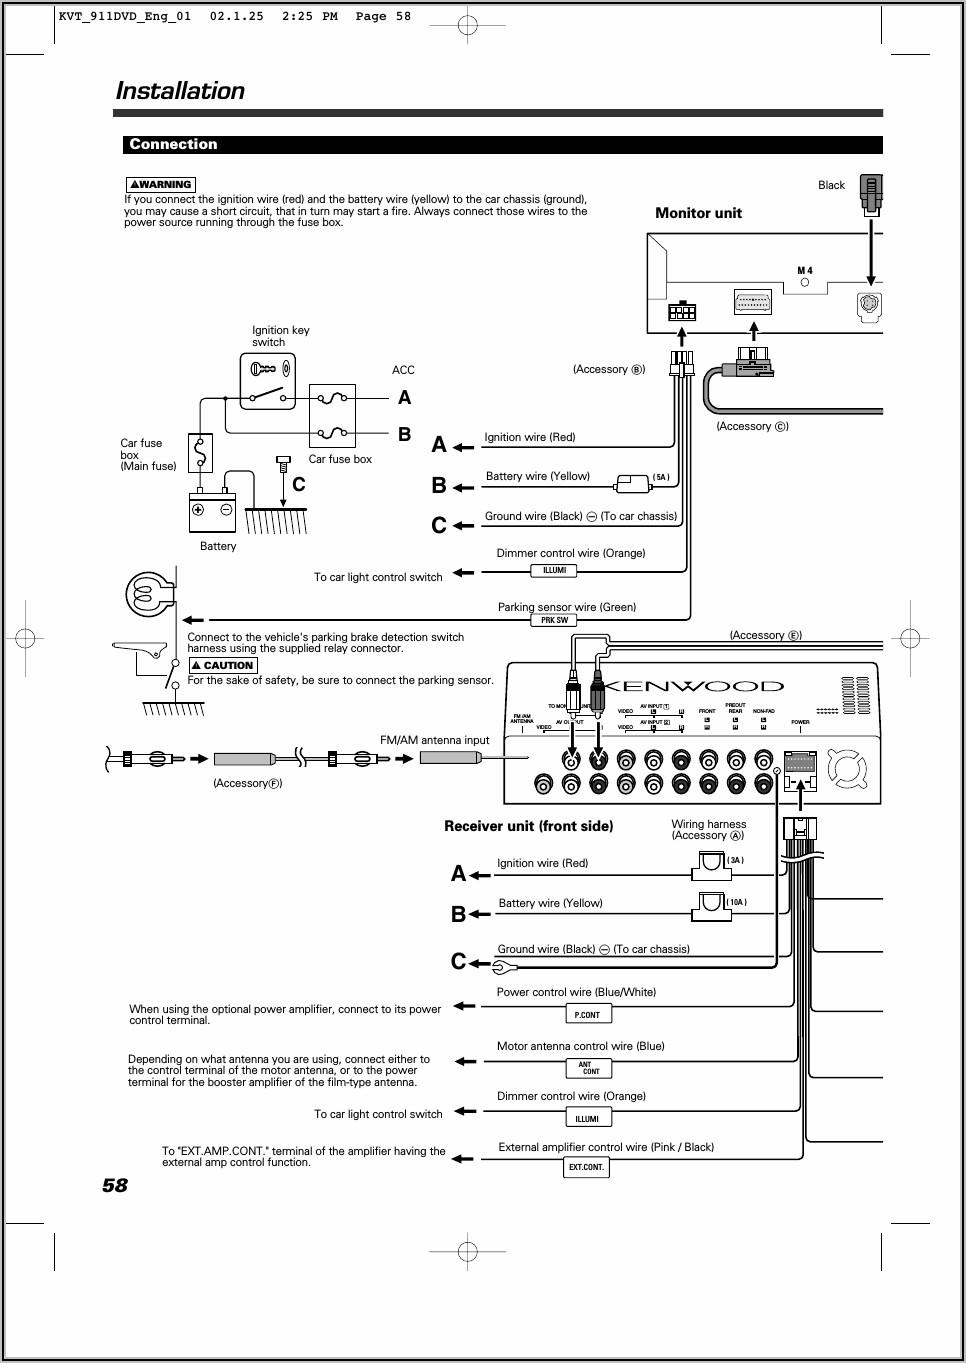 Auto Electrical Wiring Diagram Pdf